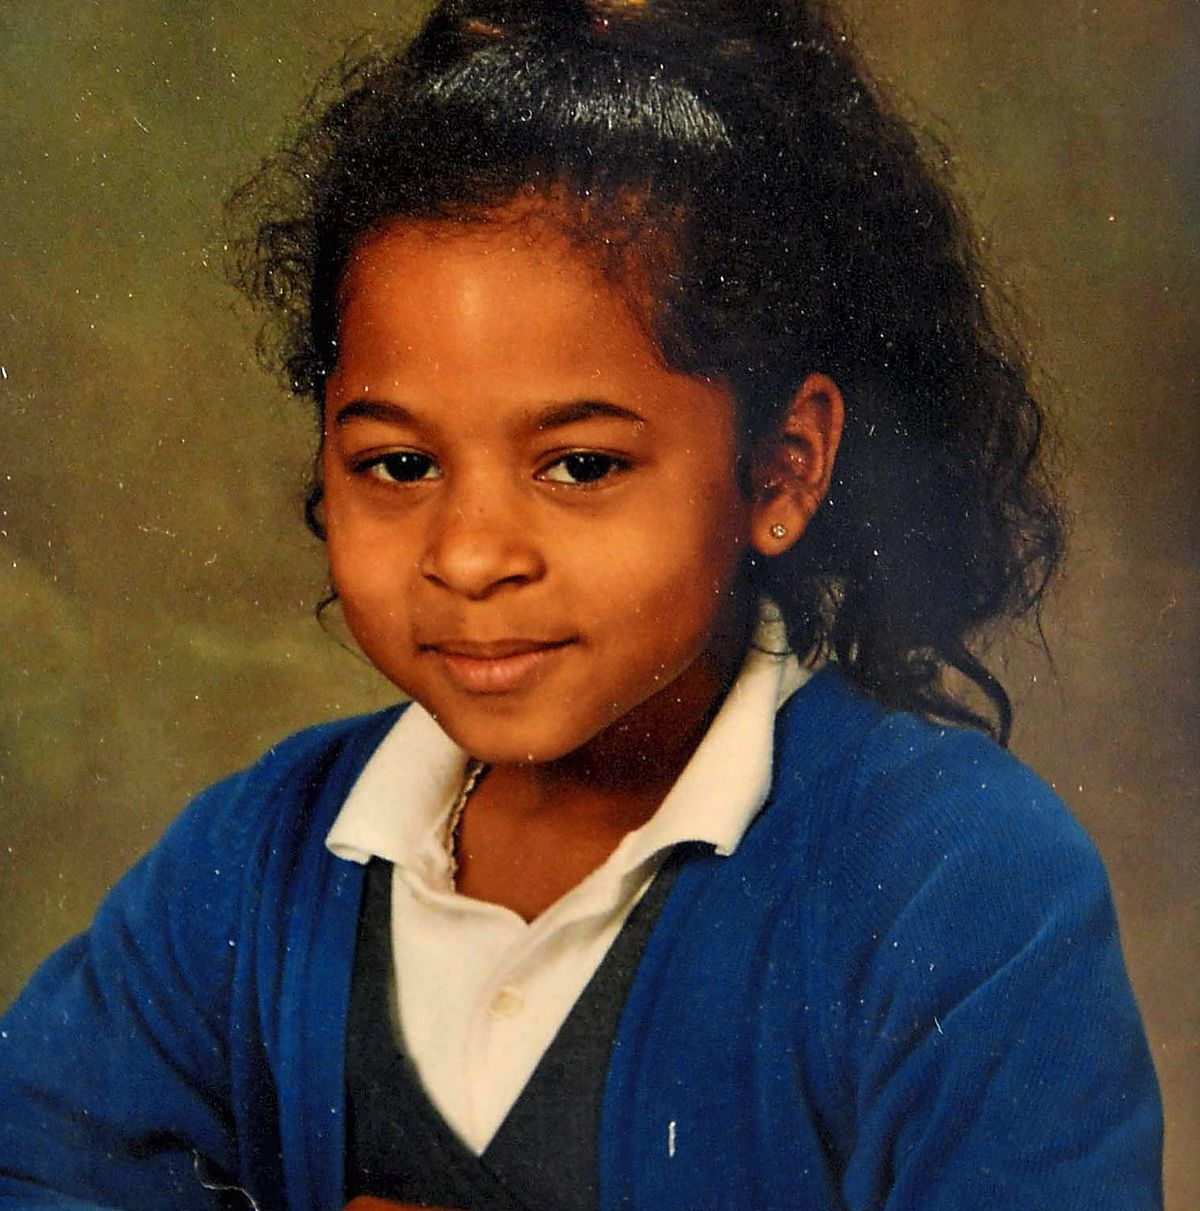 Krystie when she was at primary school